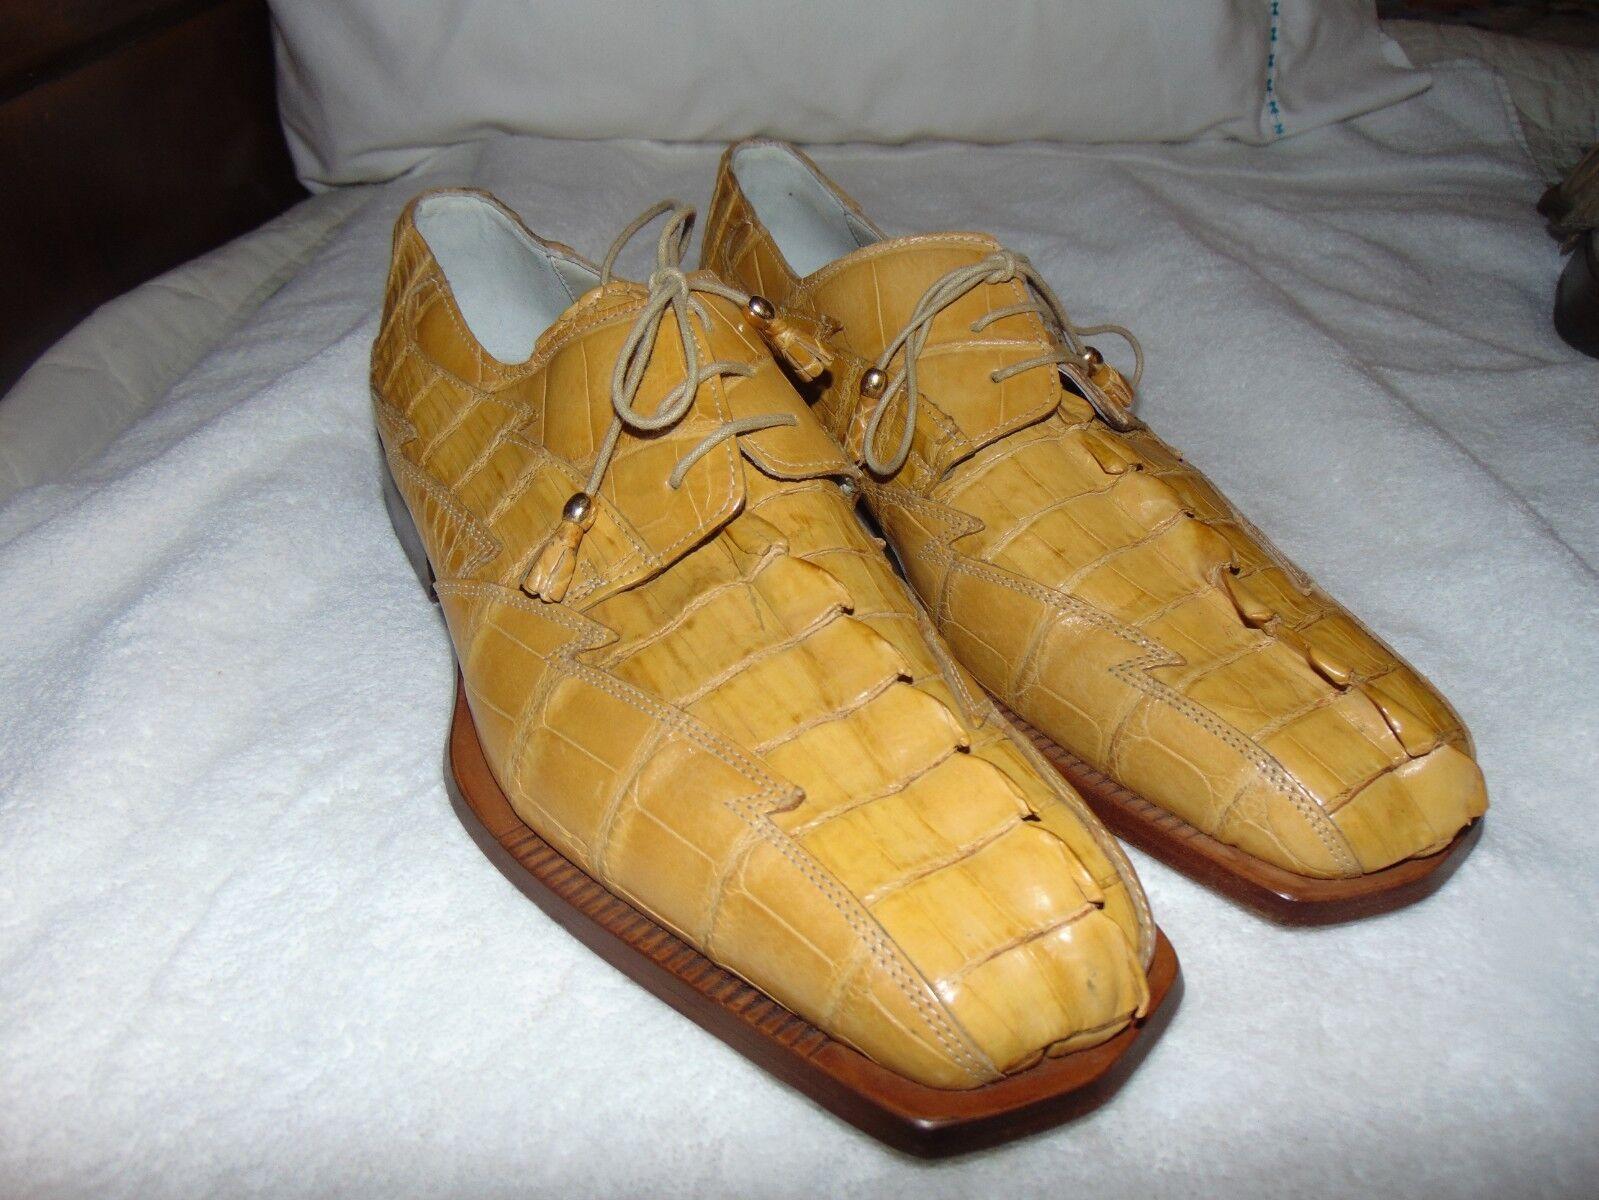 Fennix 2564 Uomo Italian Hornback Vintage Alligator Lace  Up Oxfords 12 /13  Lace 1399 7c5be0